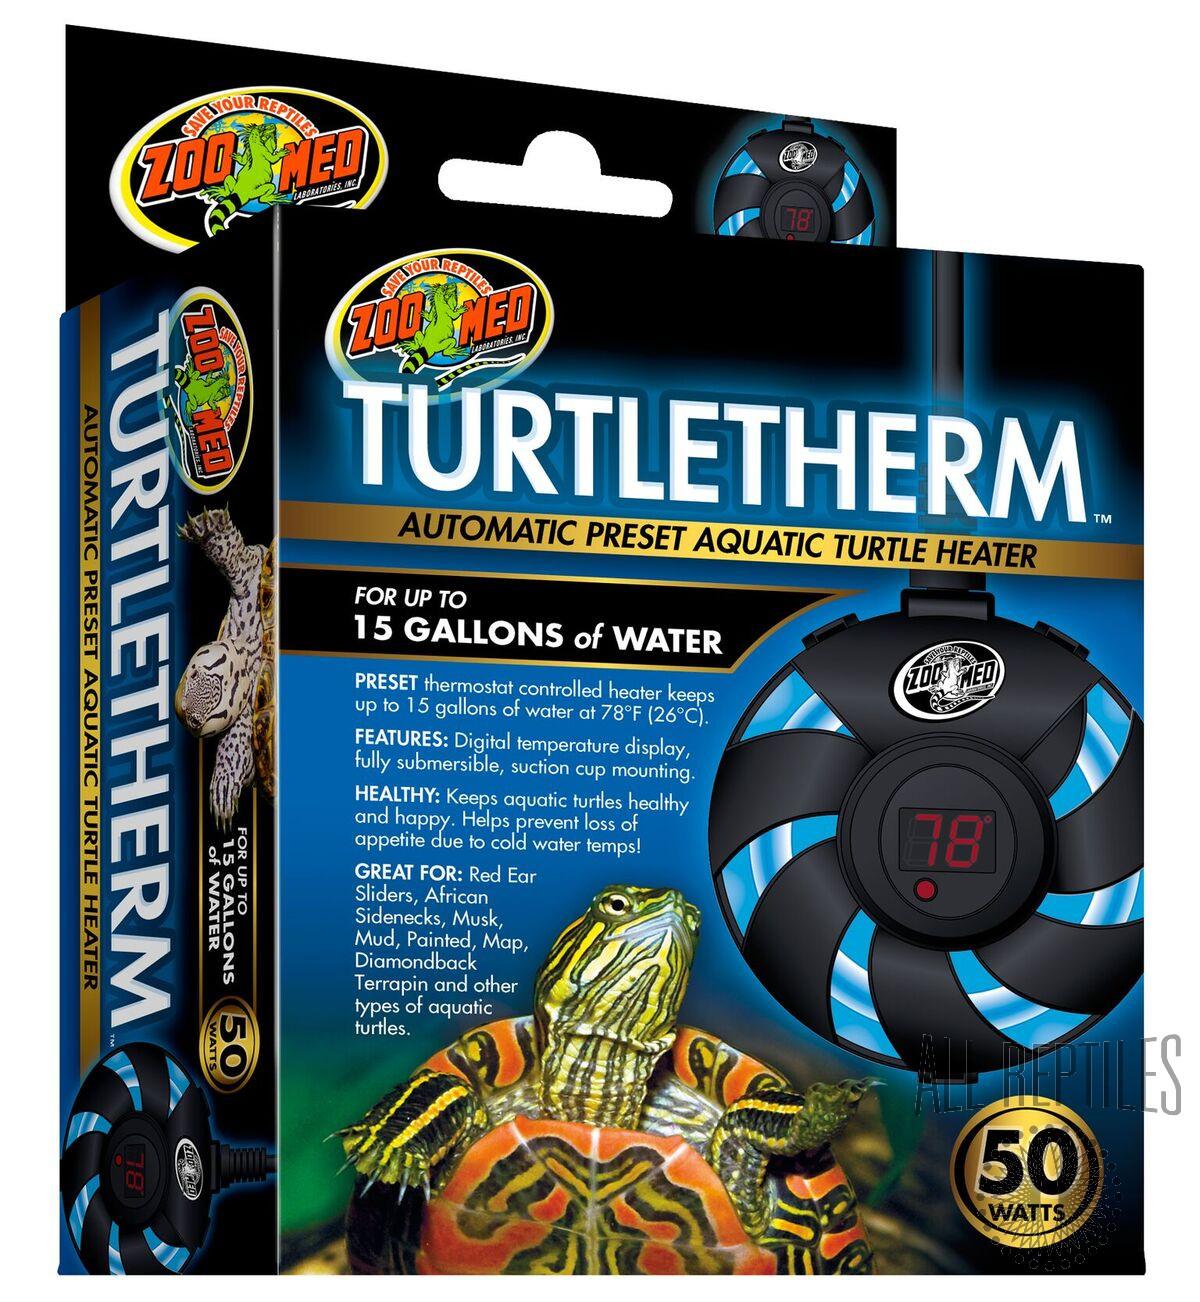 ZM Turtle Therm Aquatic Turtle Heater